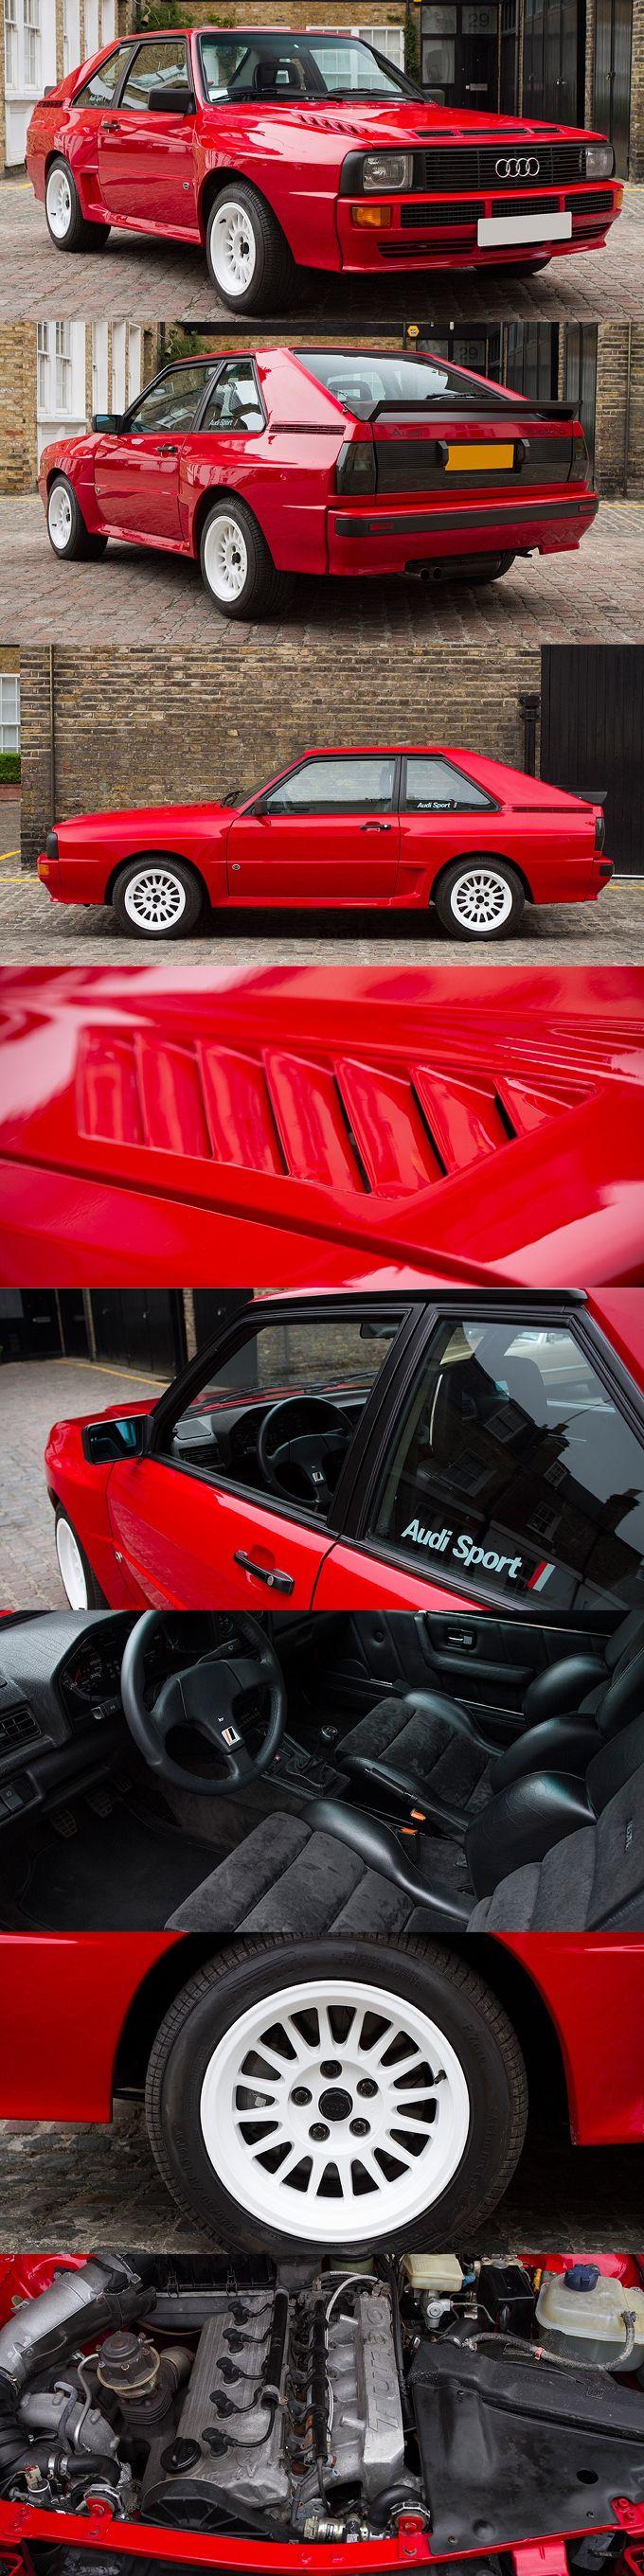 1984 Audi Sport Quattro / Germany / Group B homologation / rallye / 302hp / red white / 16-71